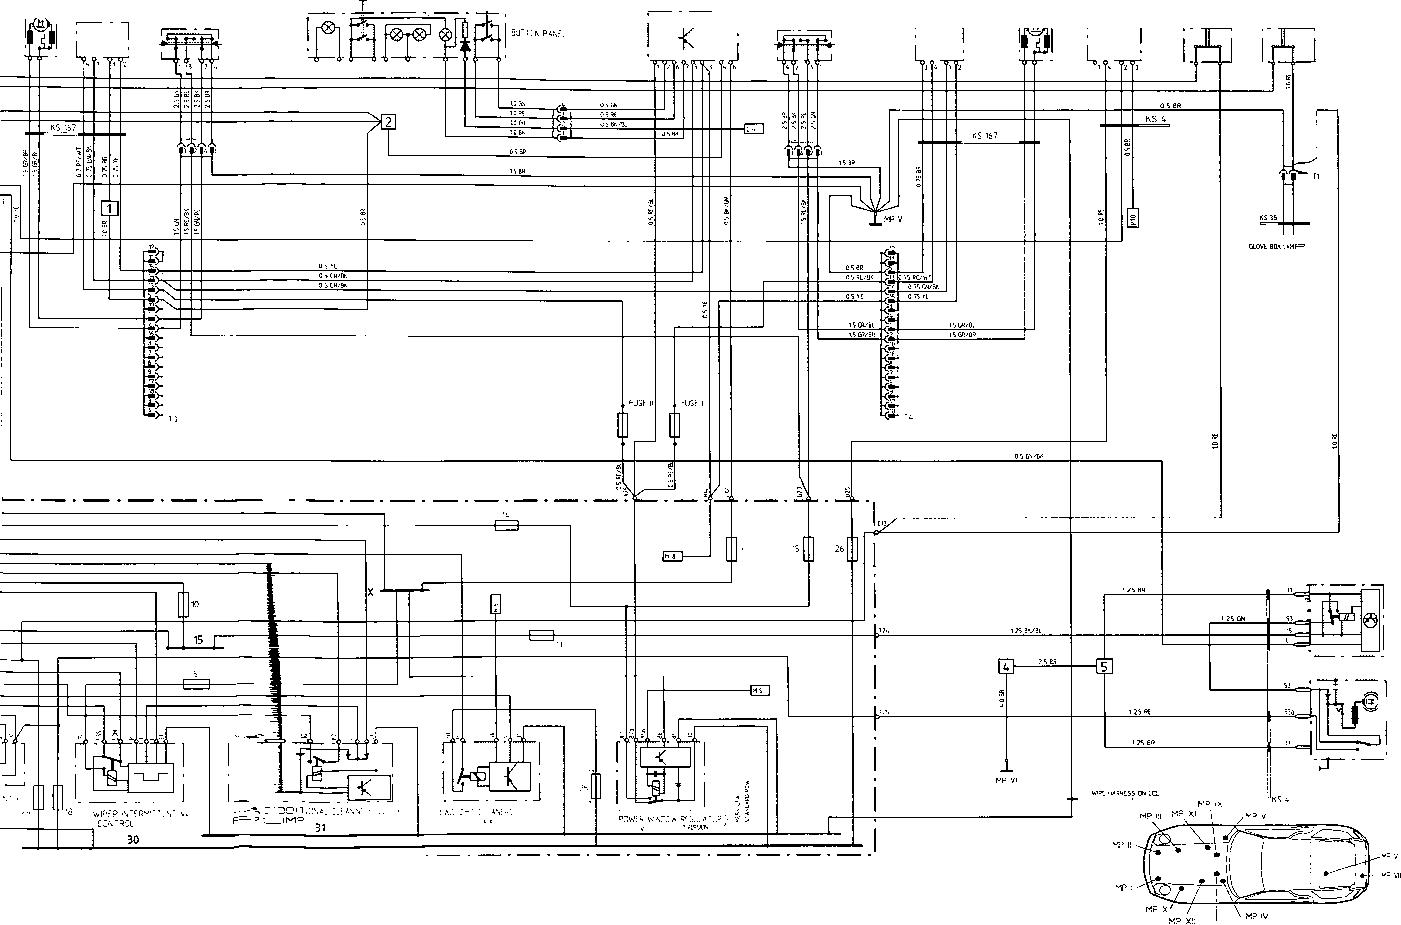 Exelent 389 peterbilt wiring schematics photo electrical and peterbilt 378 electrical diagram wiring source publicscrutiny Images